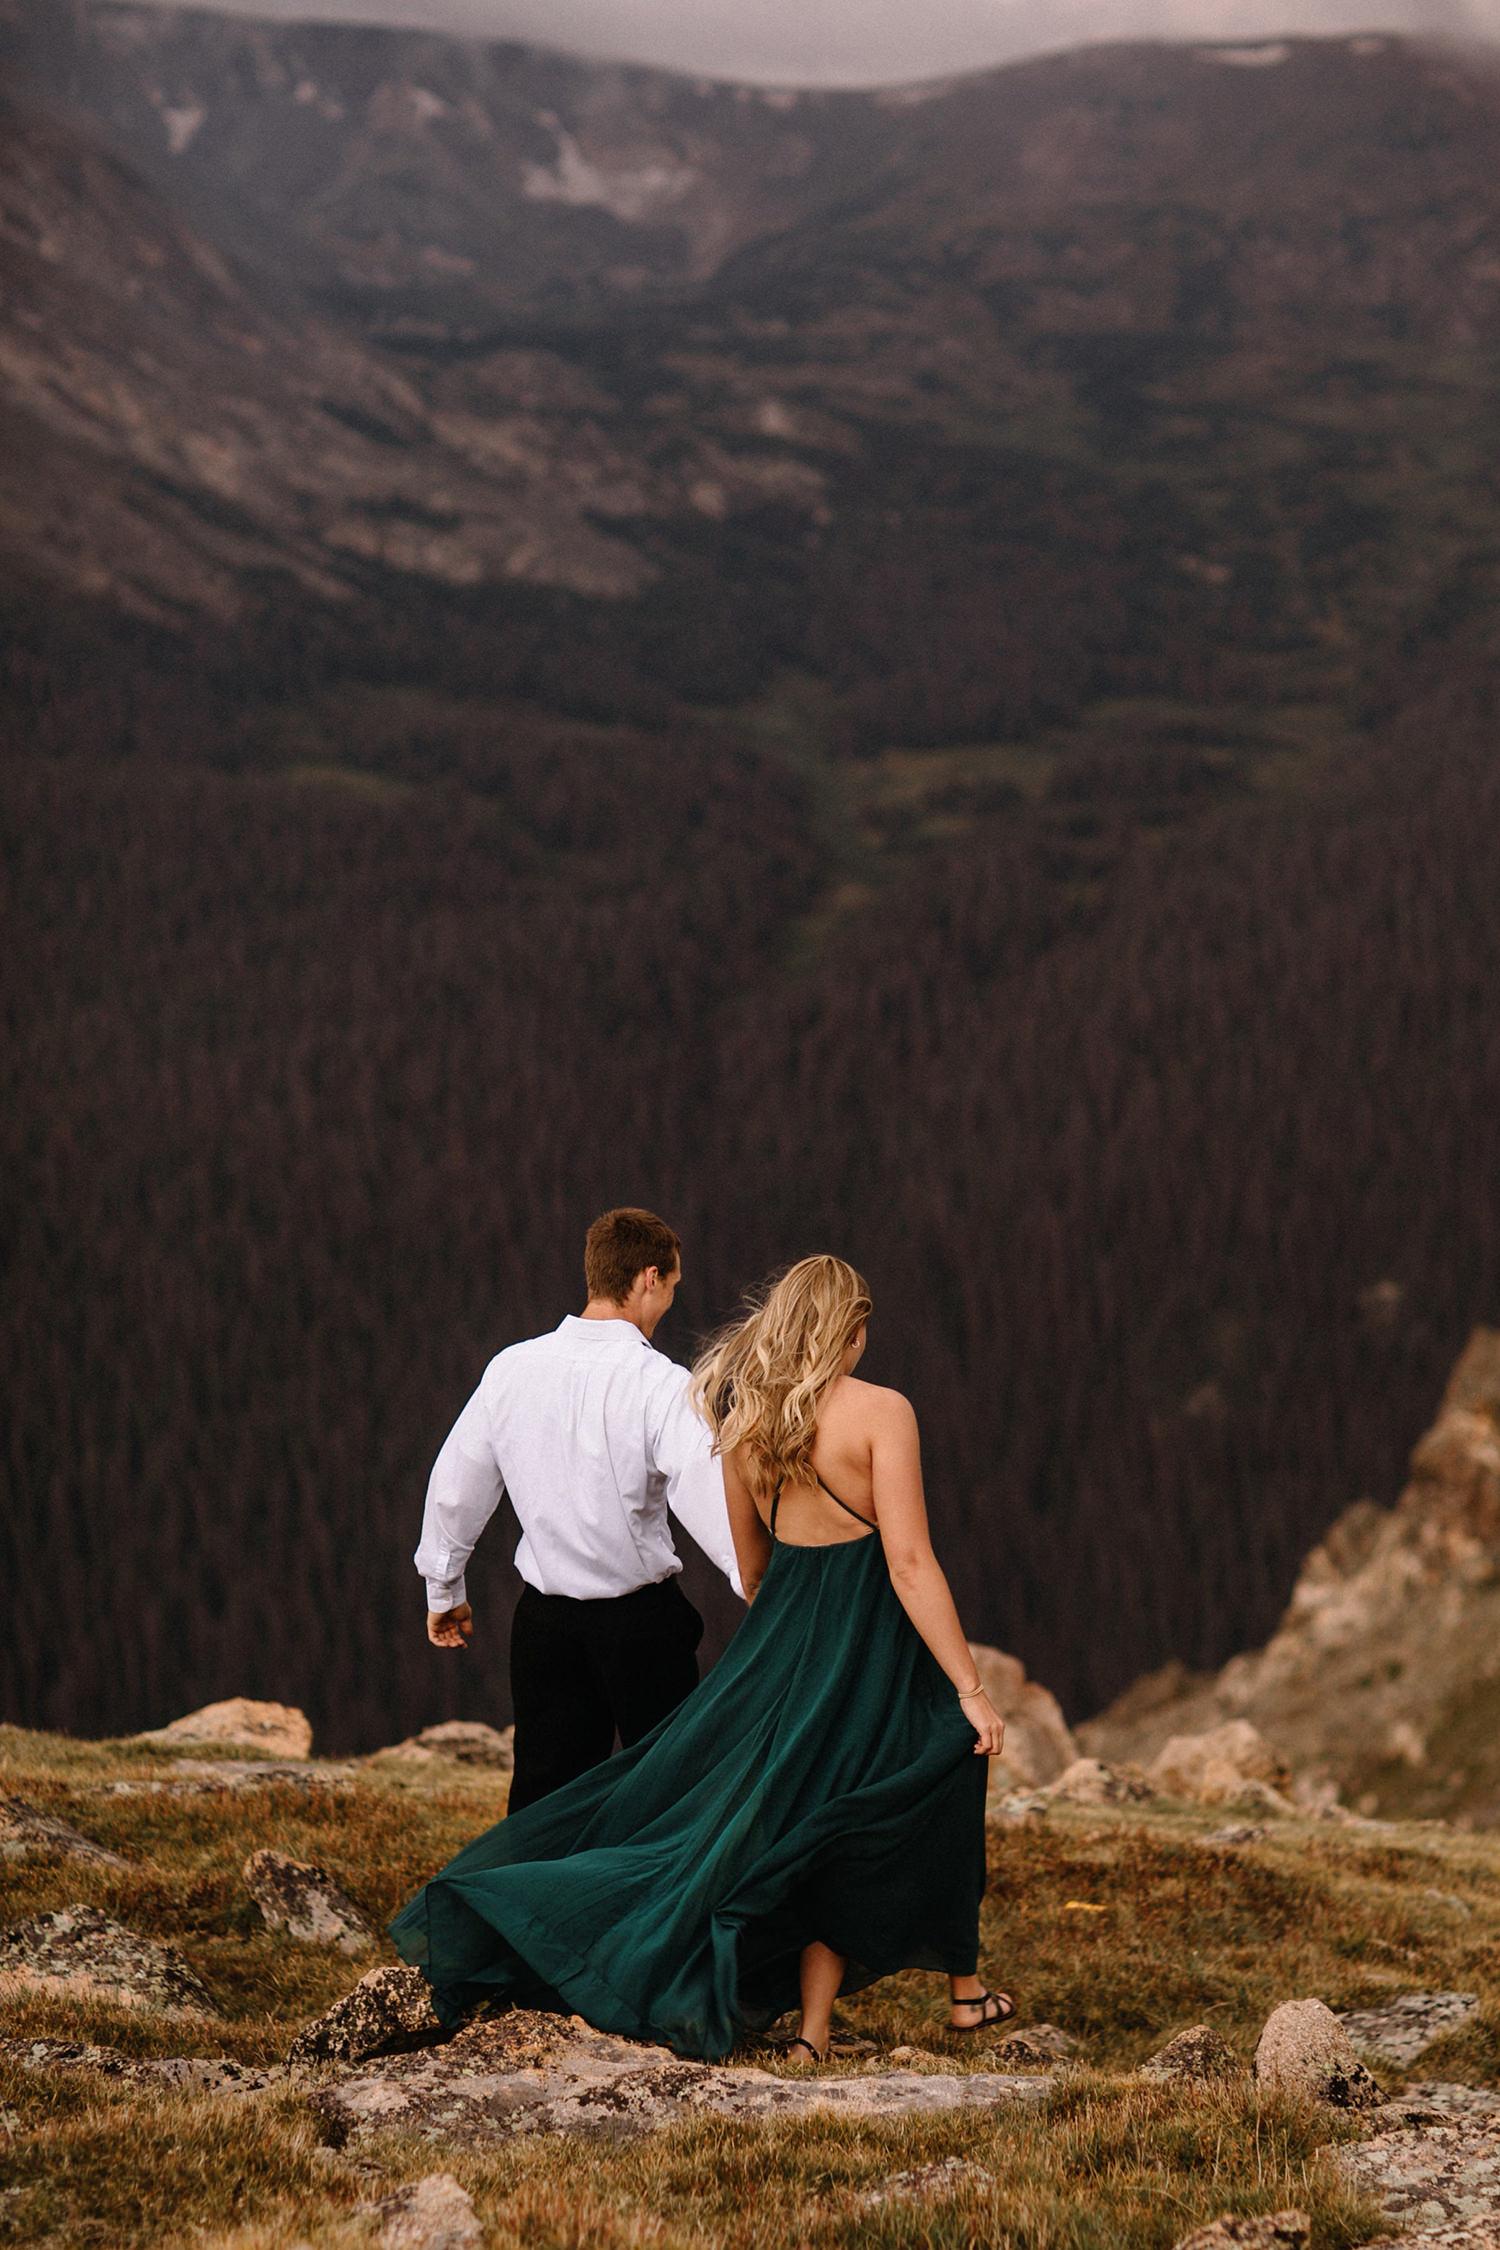 Rocky Mountain Engagement National Park Engaged Photos Wedding Elopement Portrait Mountains Trail Ridge Rd Peak Alpine Dress Lulus Rules Permit Photo Adventure Love Couples Destination Liz Osban photography Cheyenne Wyoming17.jpg